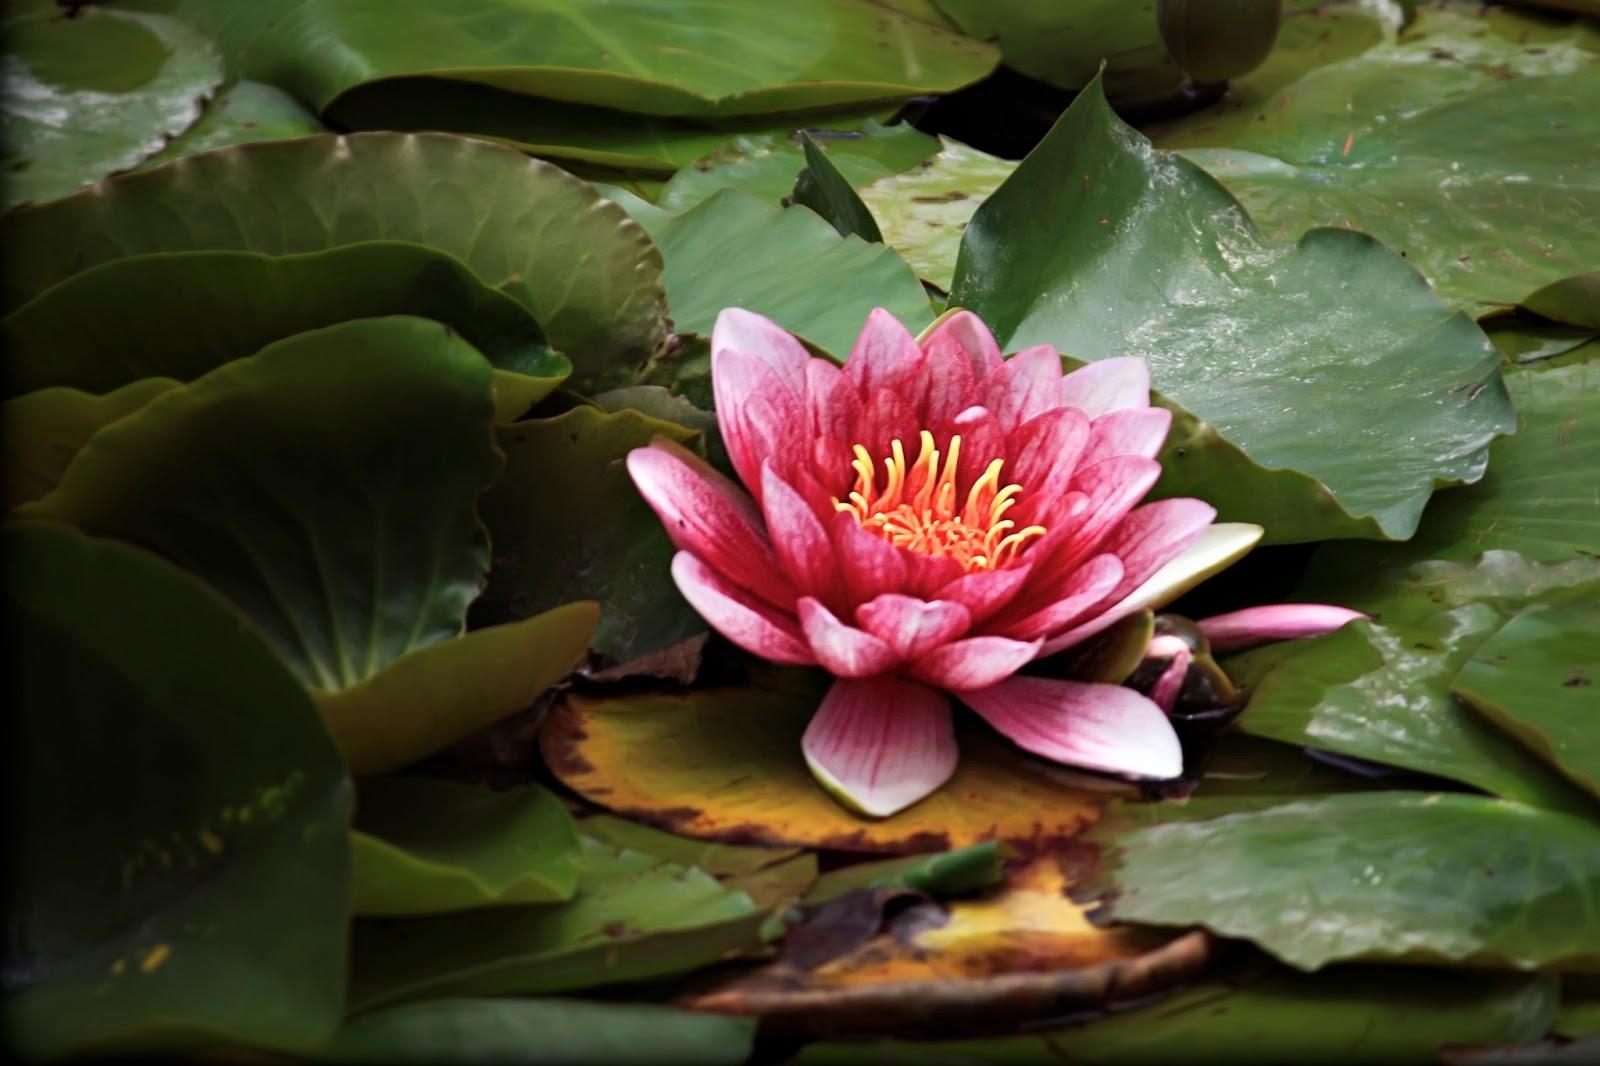 Lotus Flower HD wallpapers | HD Wallpapers (High ...